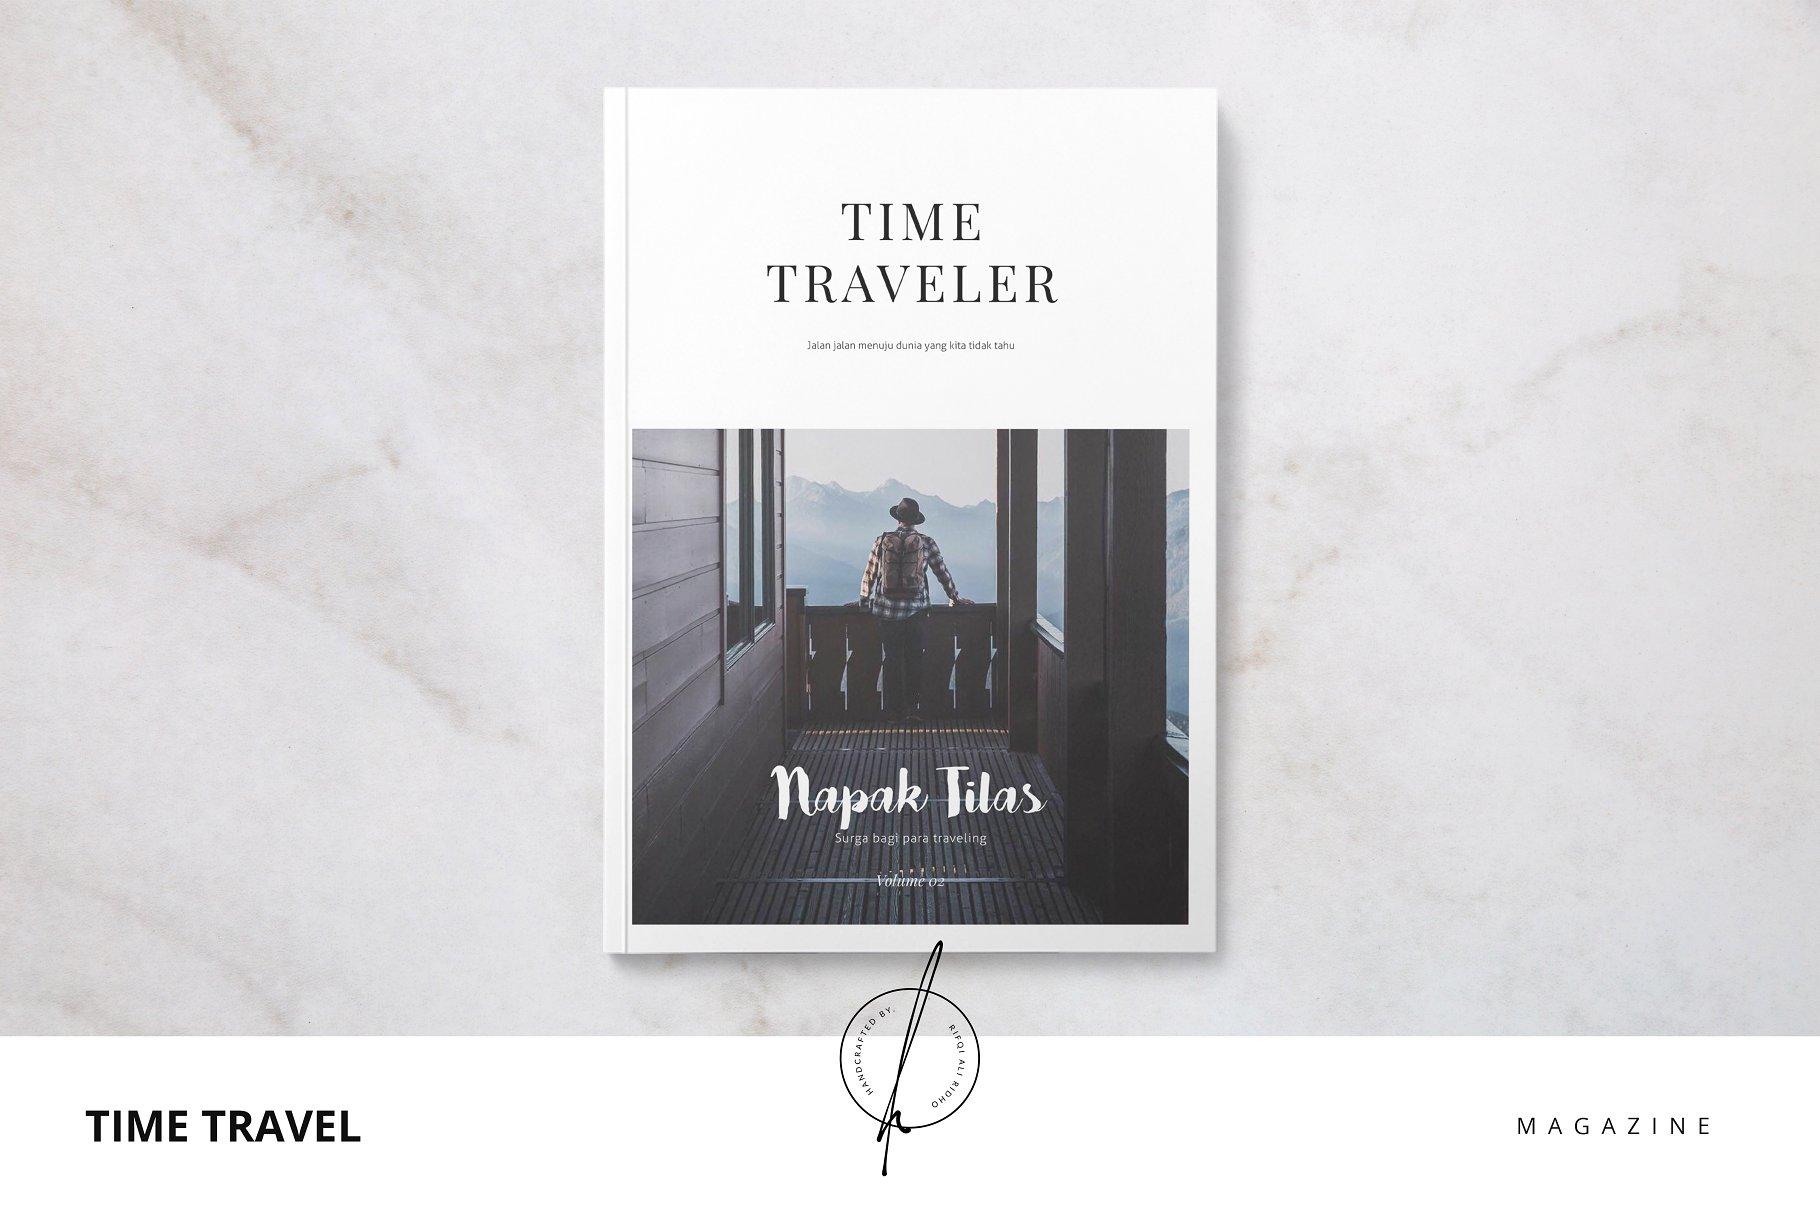 Time Traveler Magazine - Magazine Templates | Creative Market Pro